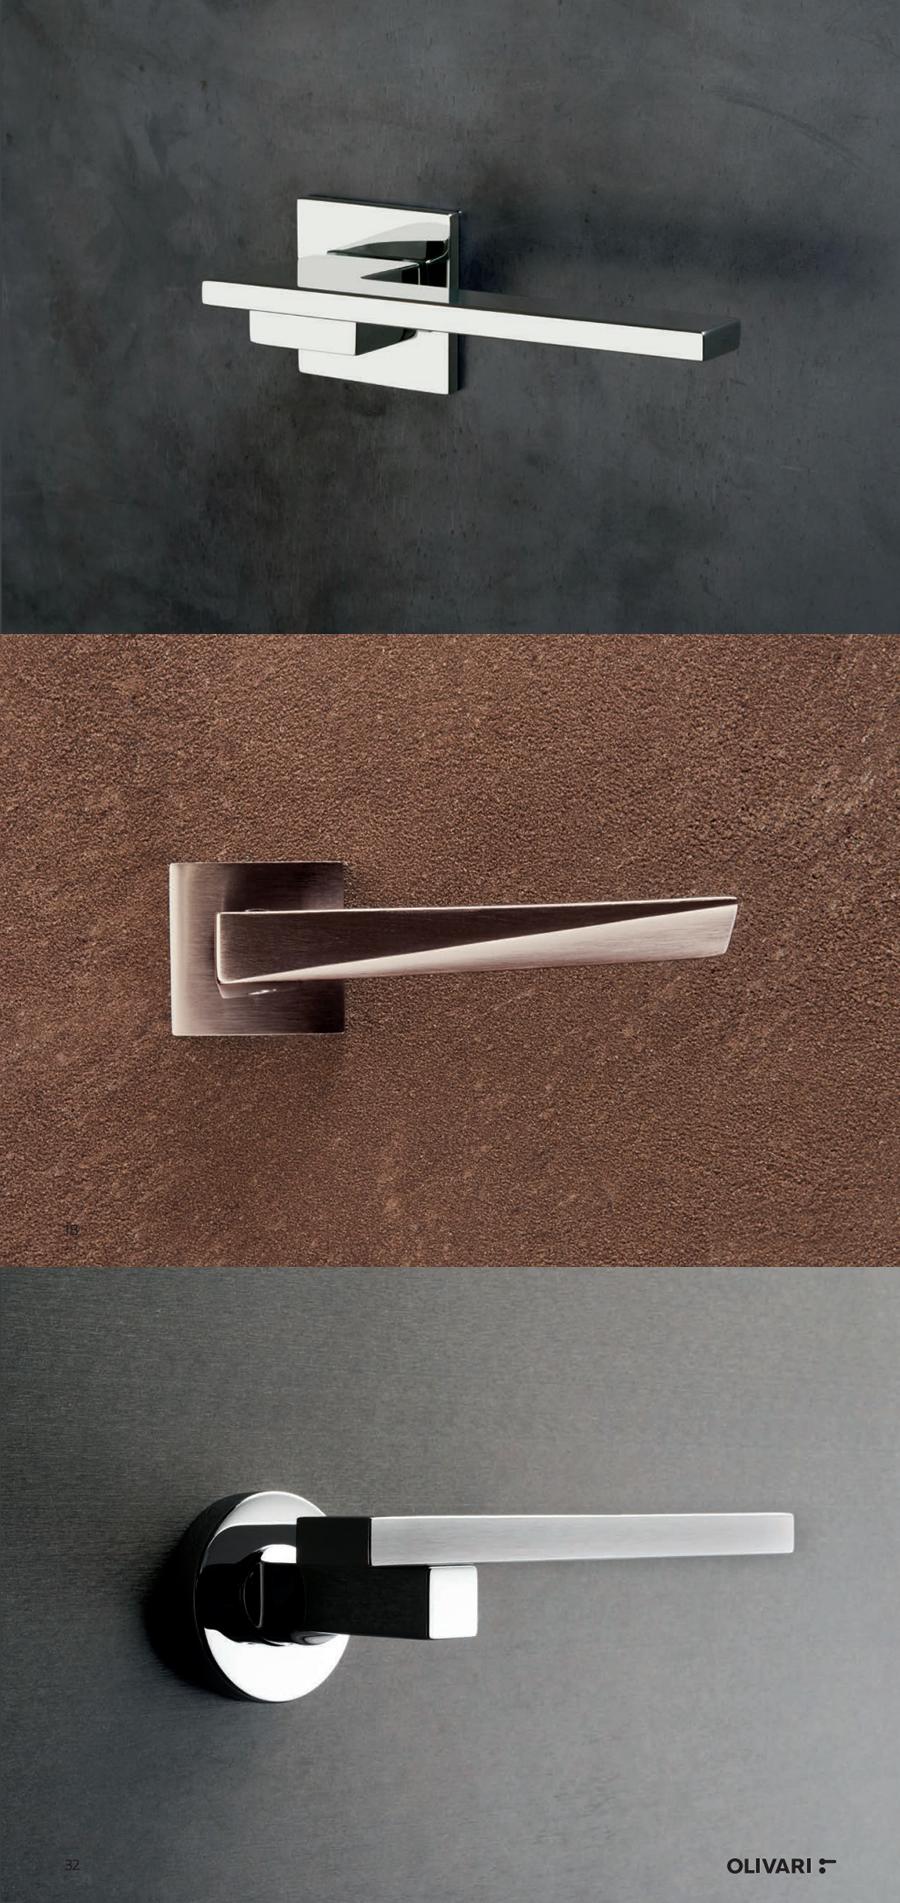 Maniglie Olivari Design 2020 Tendenze